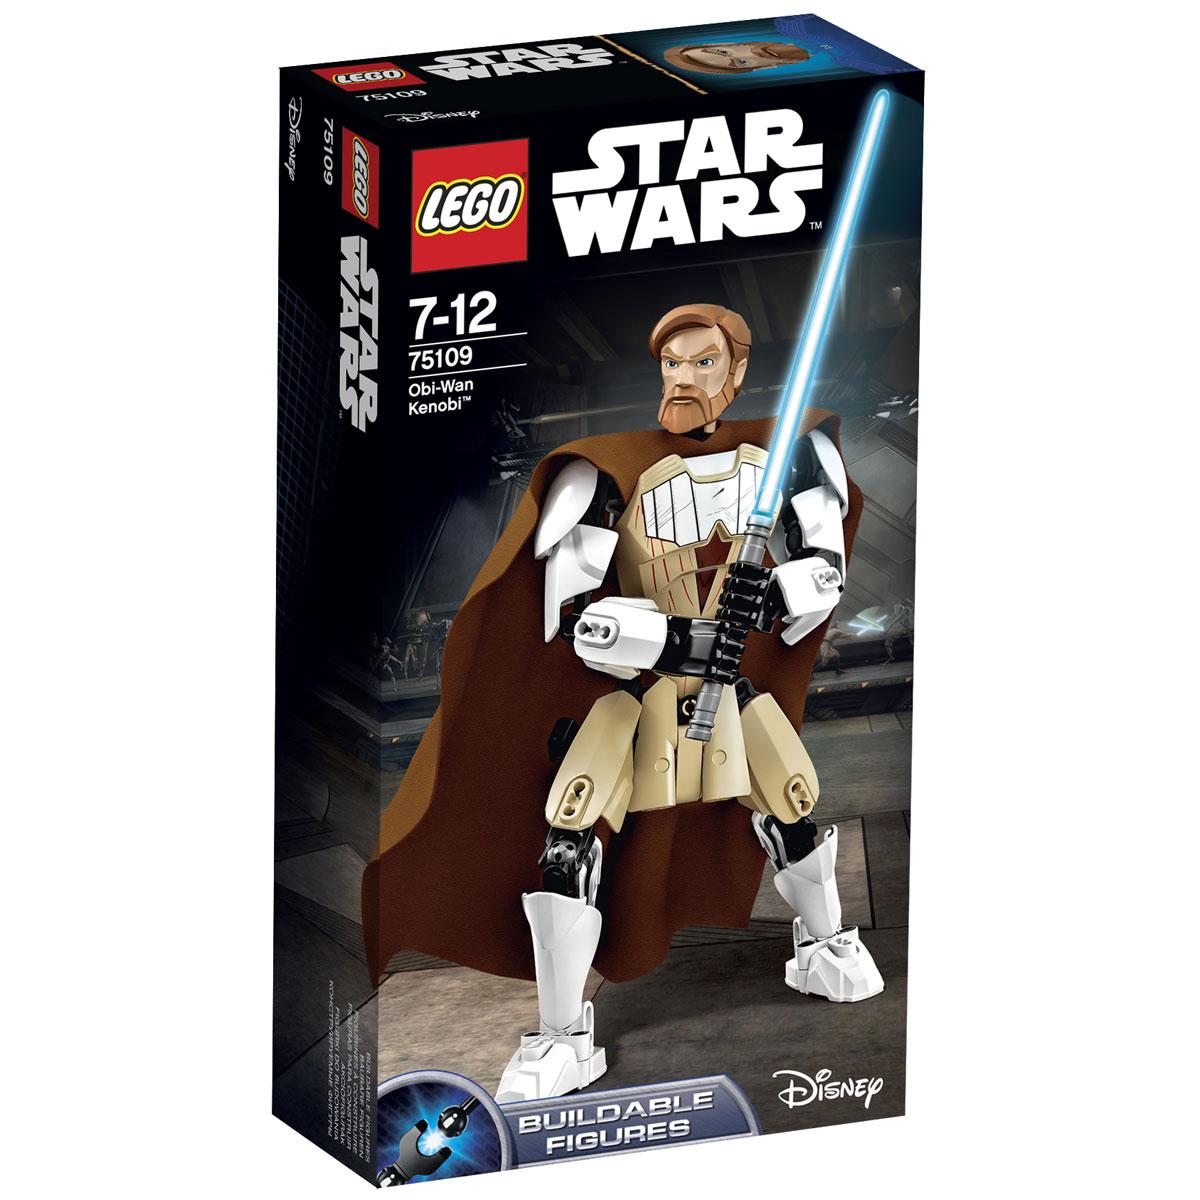 LEGO Star Wars Фигурка-конструктор Оби Ван Кеноби 75109 star wars оби ван кеноби 75109